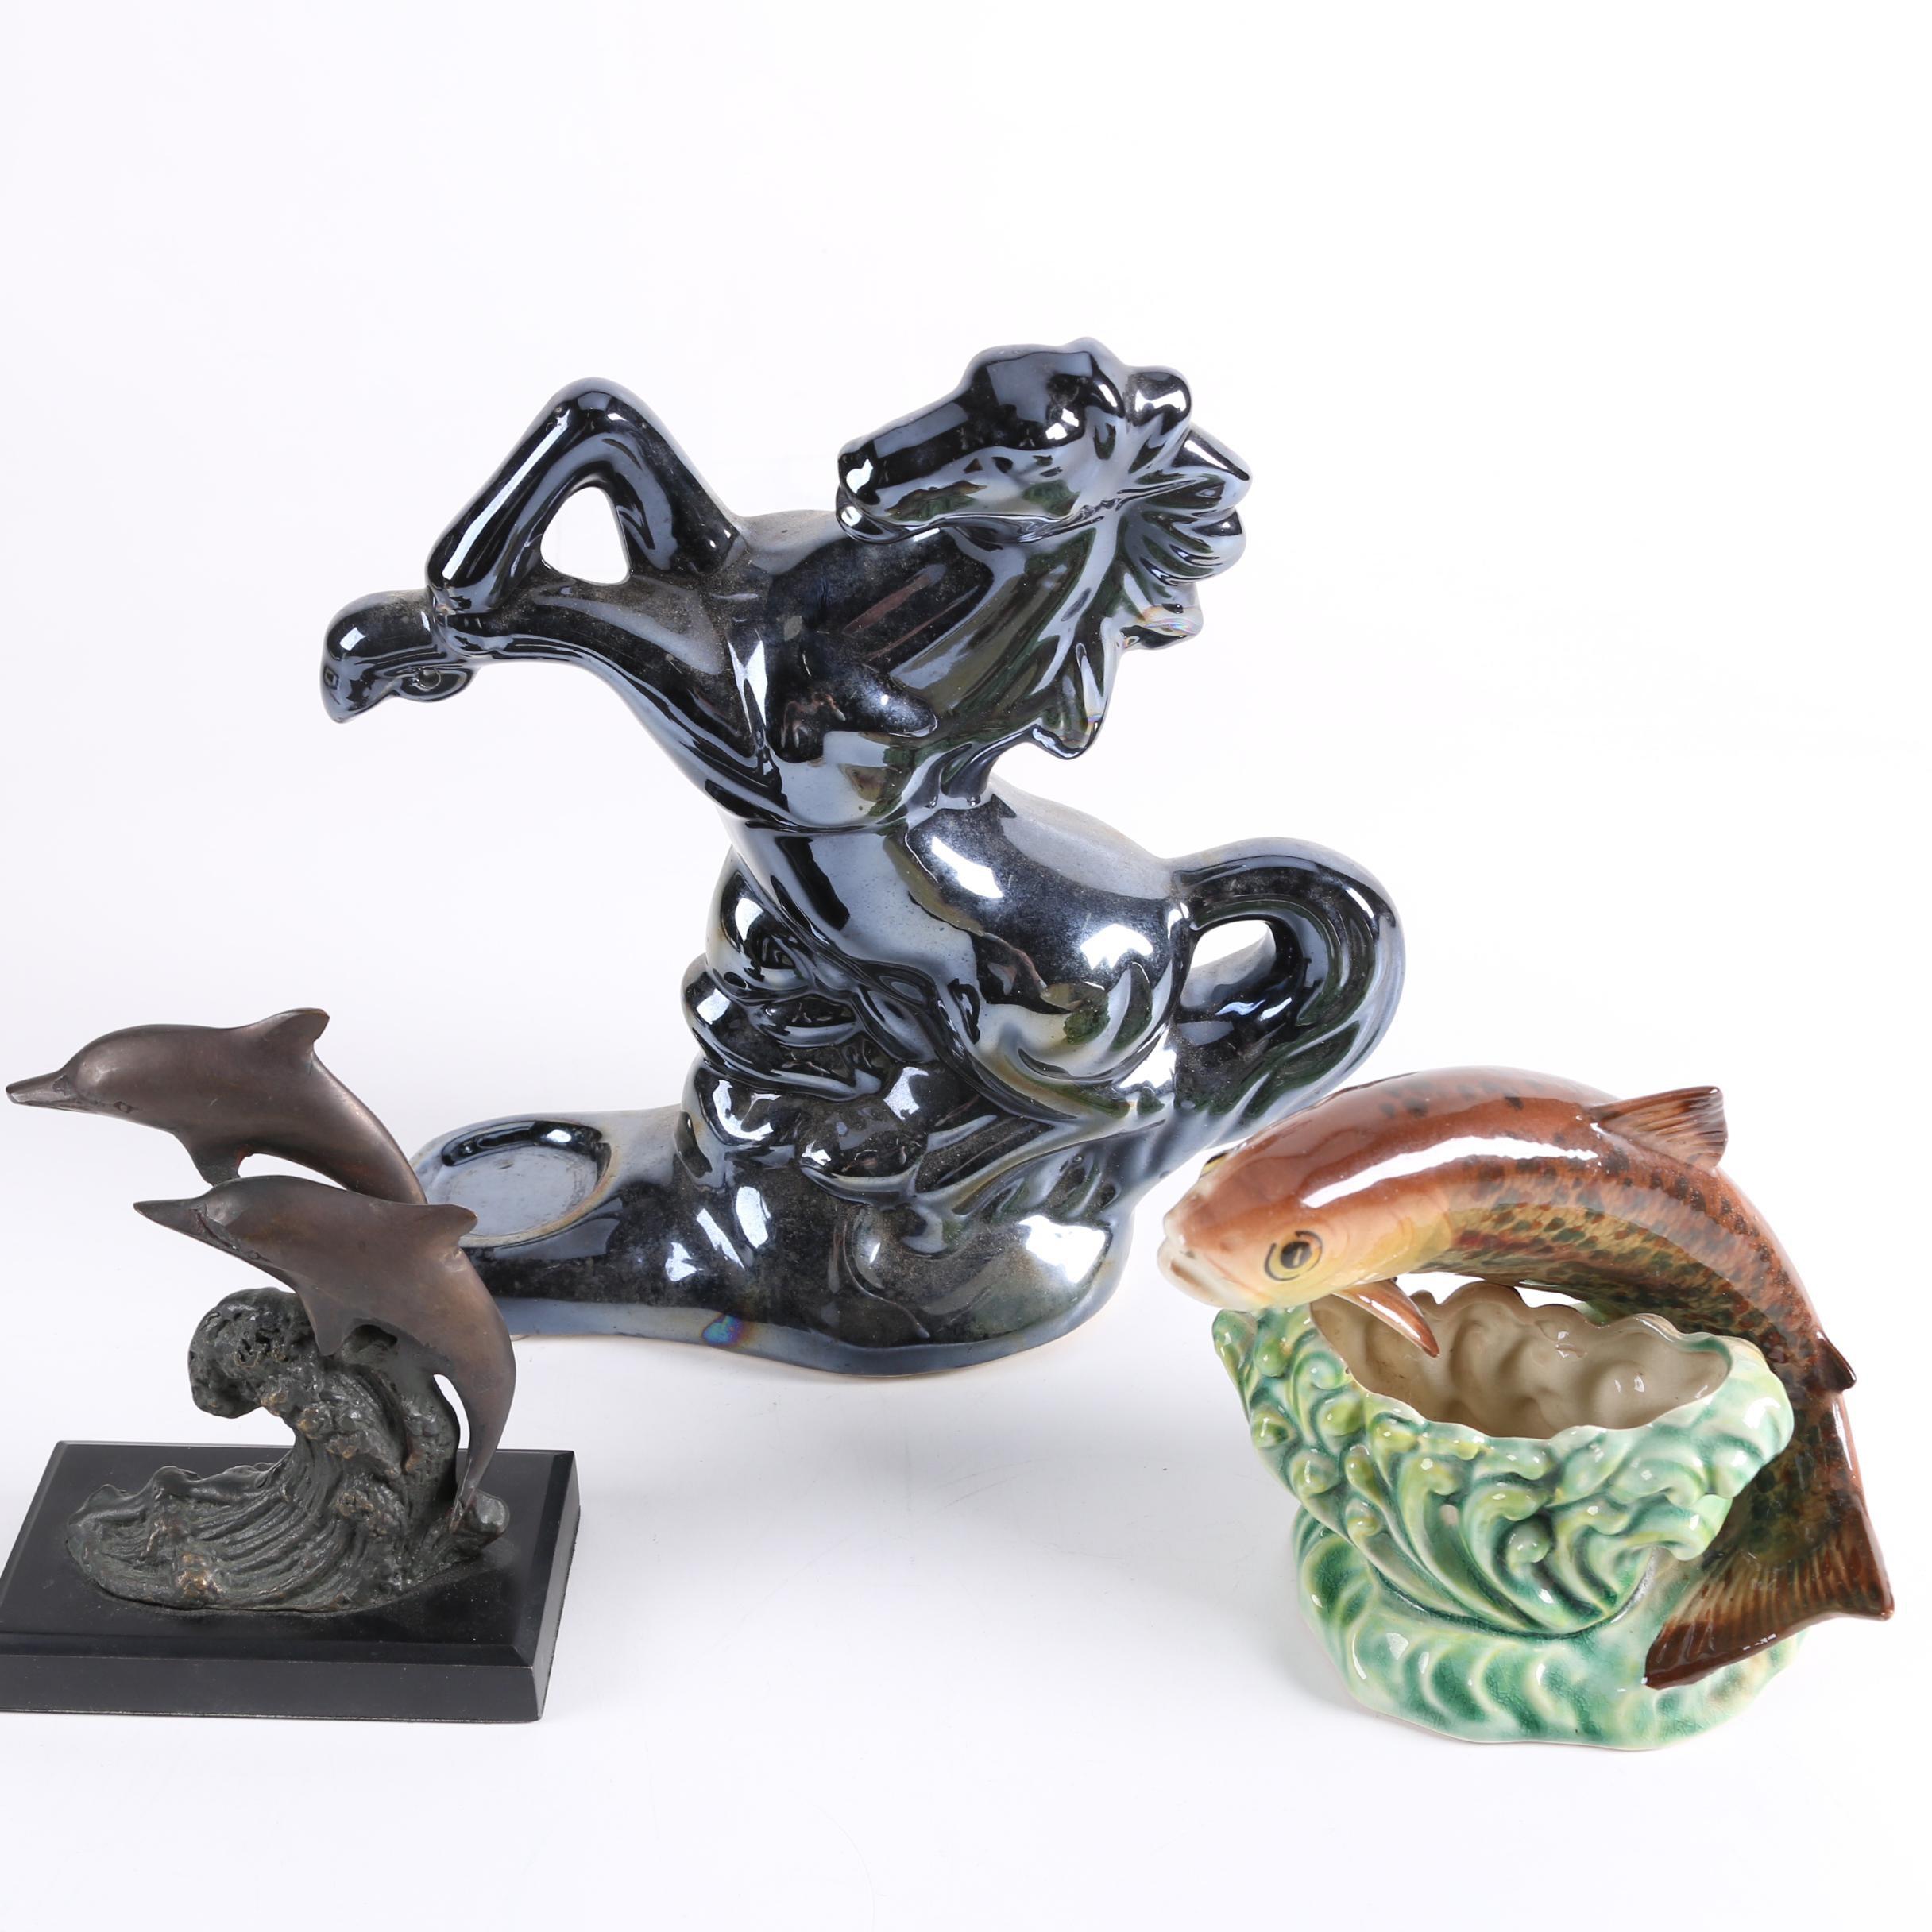 Metal and Ceramic Animal Figurines Including Marex